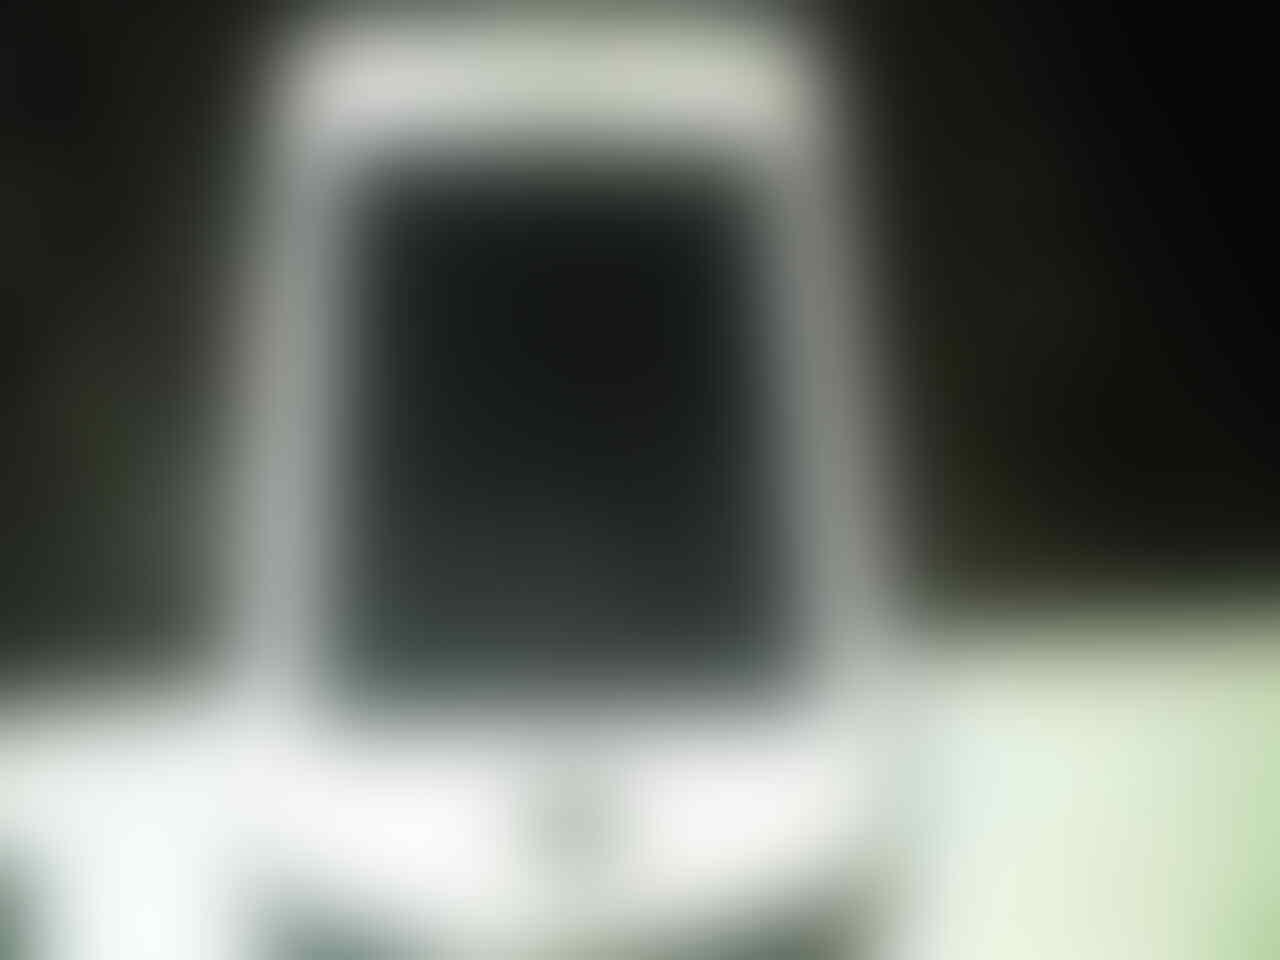 WTS Blackberry Torch 2 9810 murah aja..